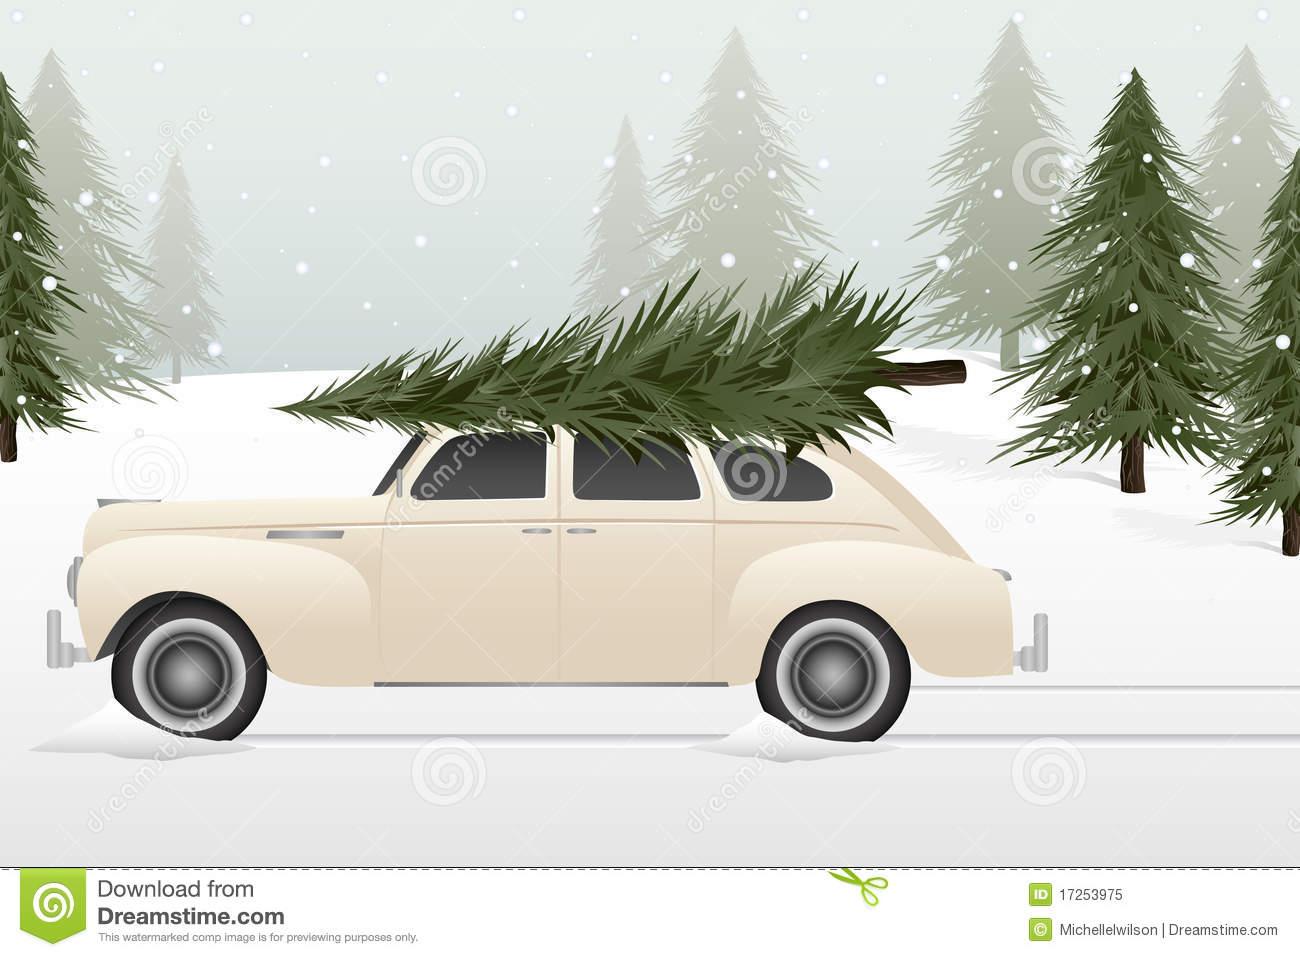 Retro Car Christmas Tree Clipart 20 Free Cliparts